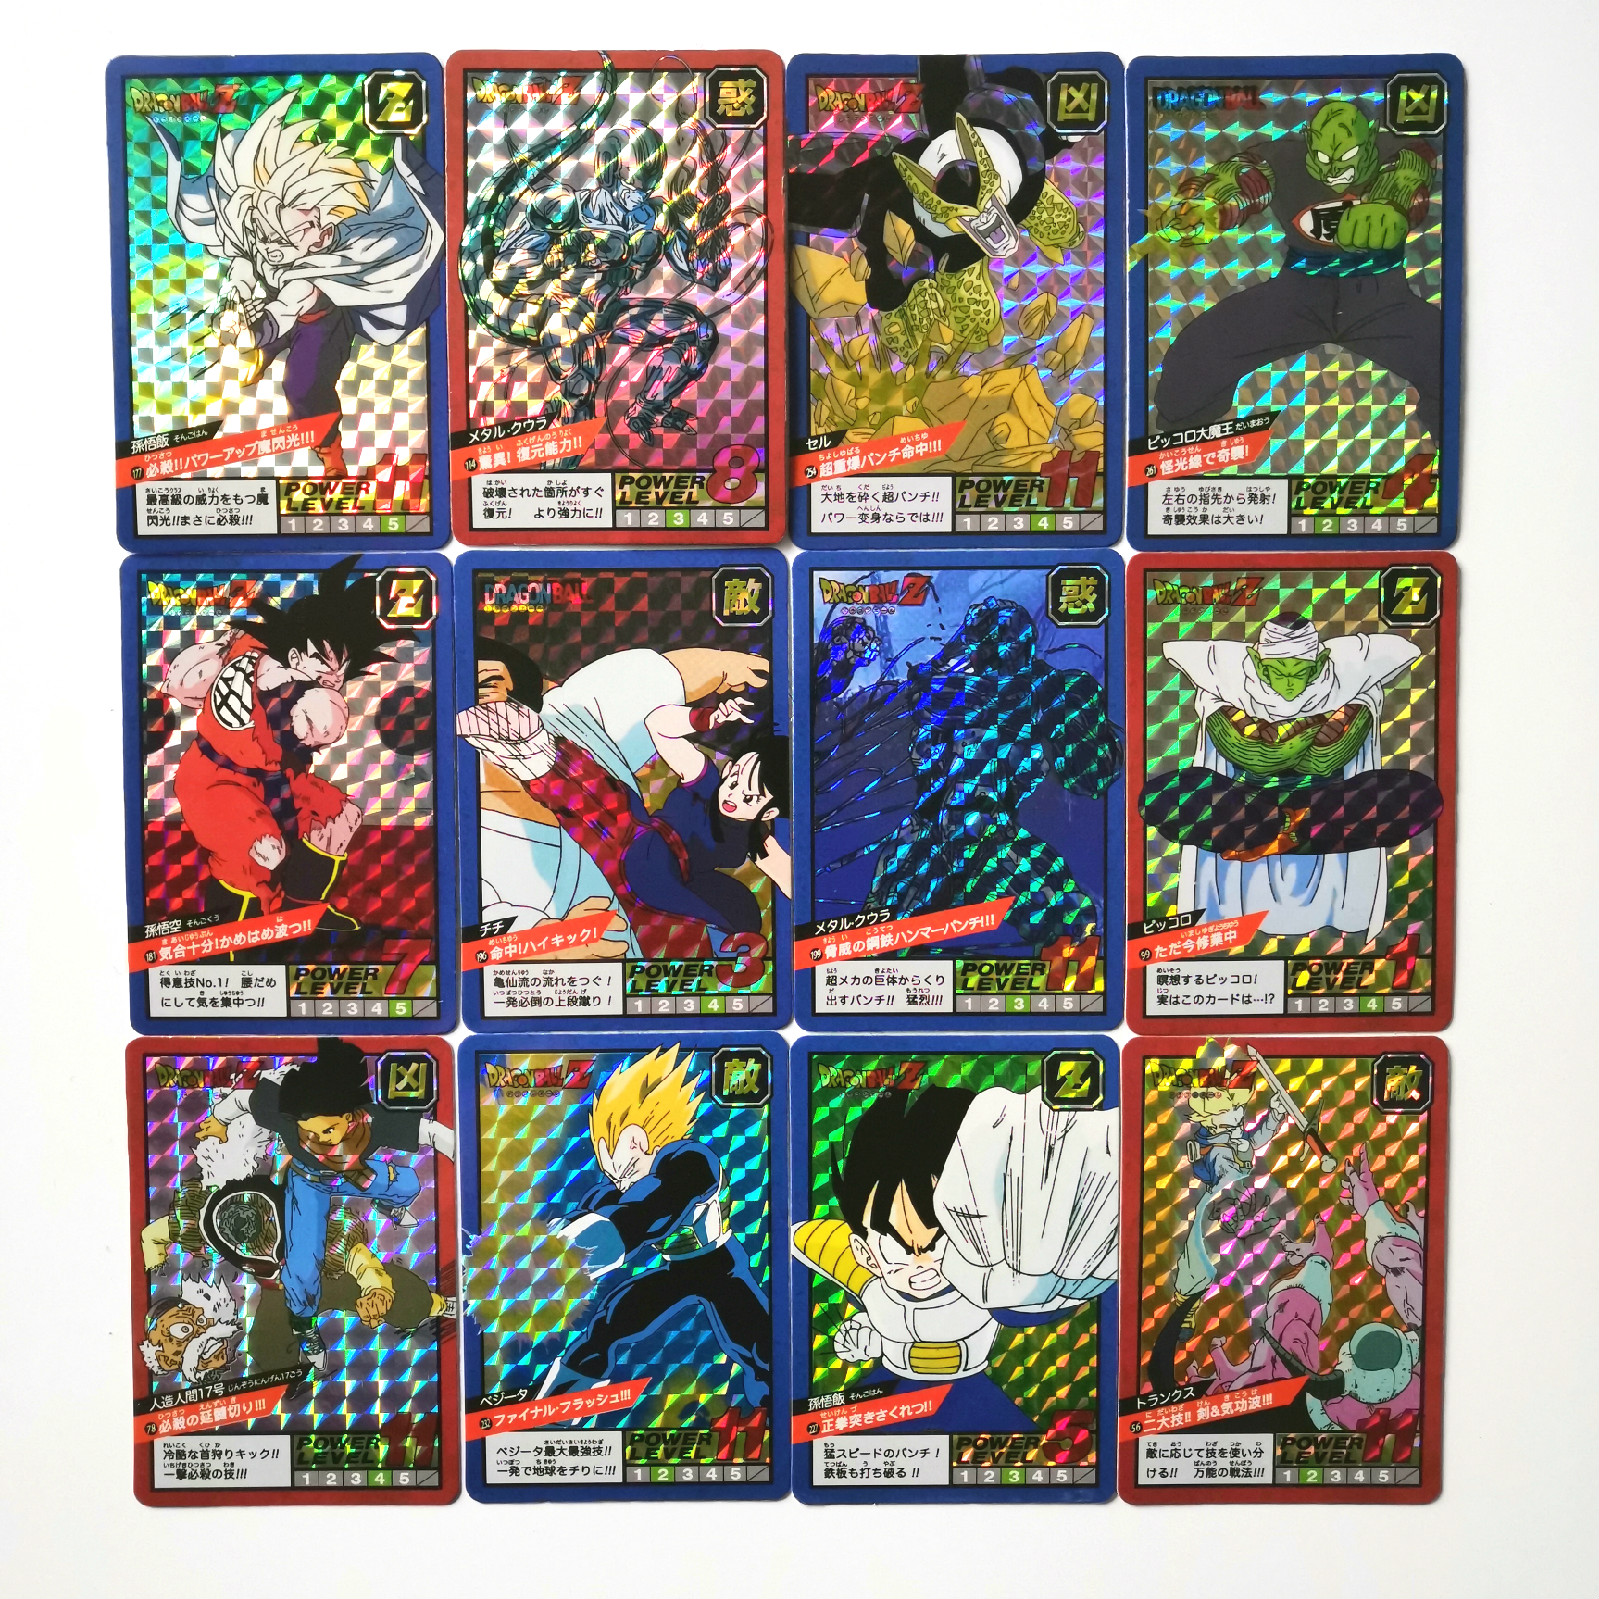 22pcs Super Dragon Ball Z Fighting PP20 Heroes Battle Card Ultra Instinct Goku Vegeta Game Collection Cards